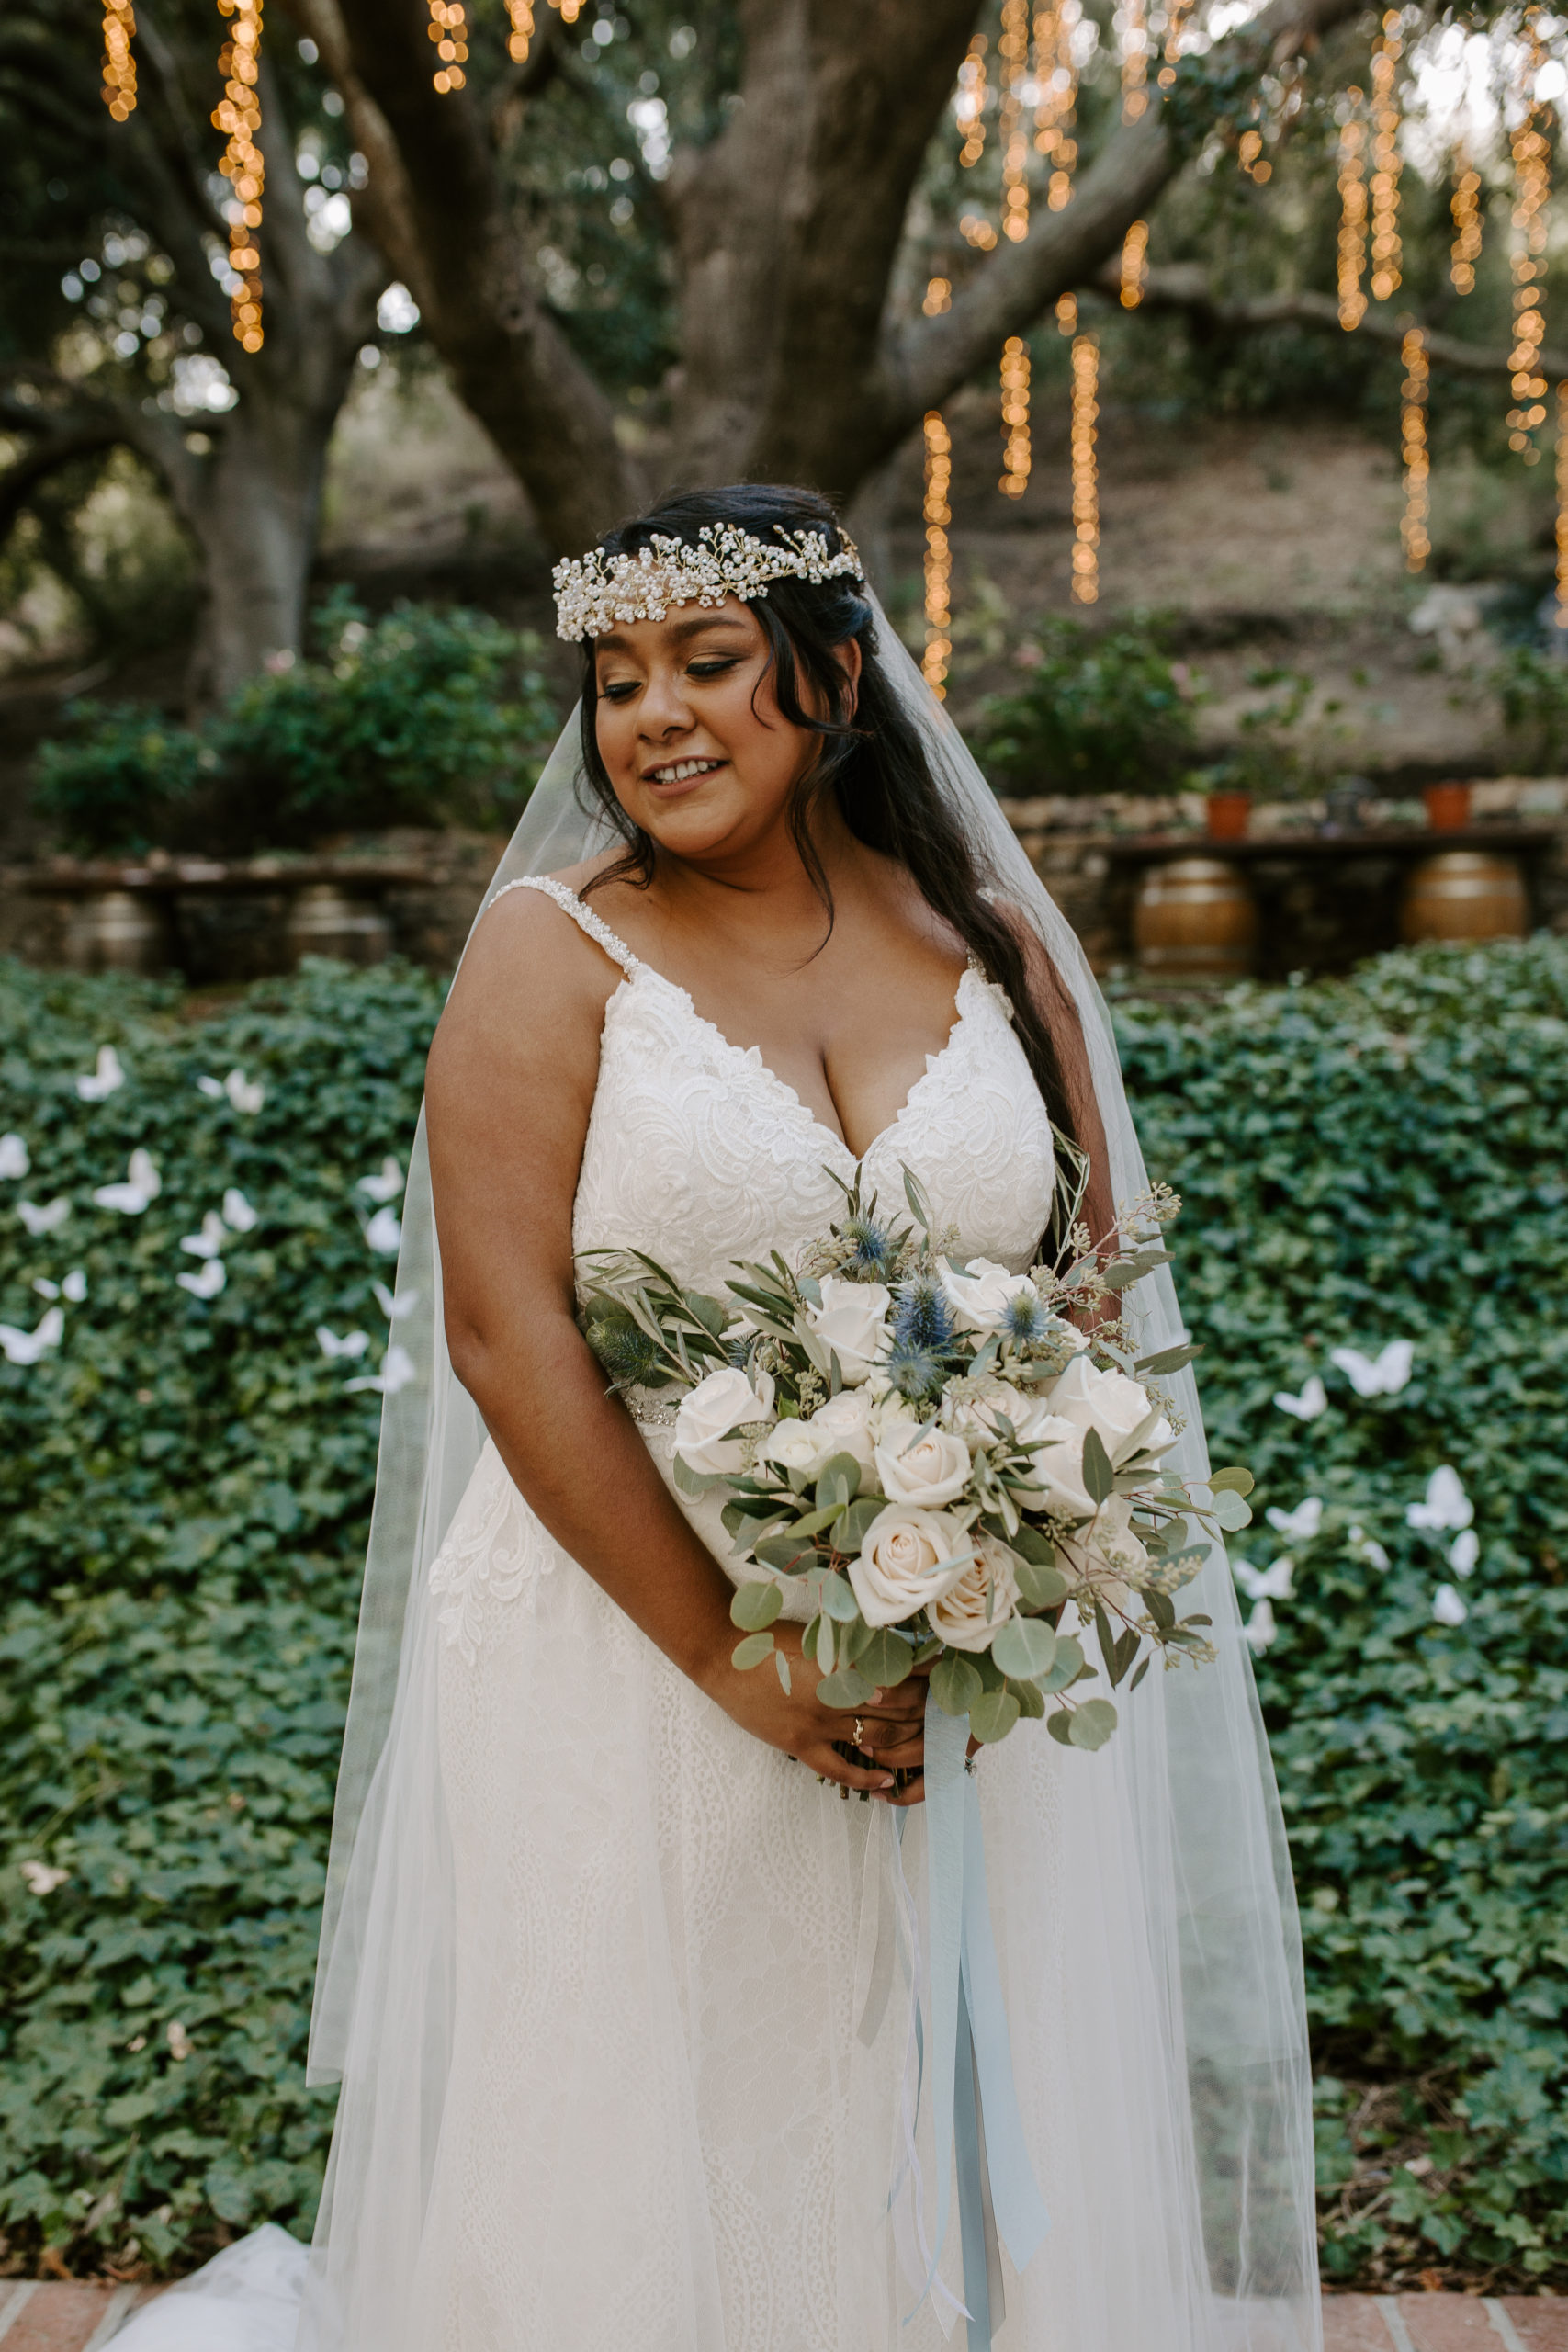 Kiki's Enchanted Forest Fairytale Wedding